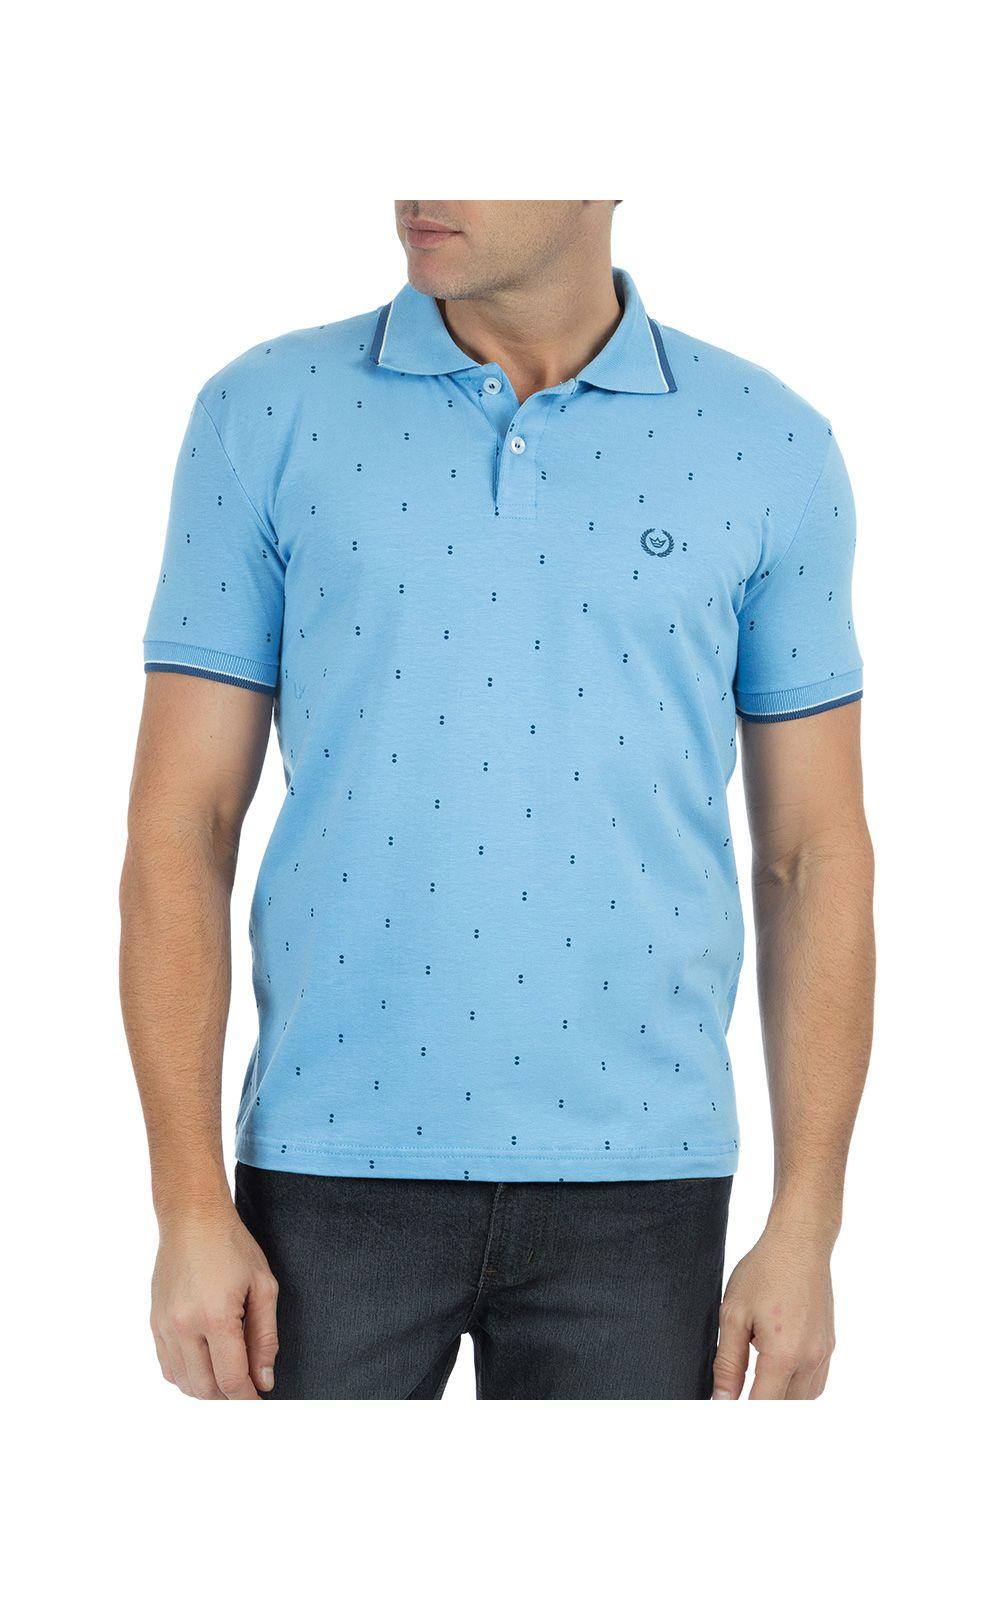 Foto 1 - Camisa Polo Masculina Azul Claro Estampada